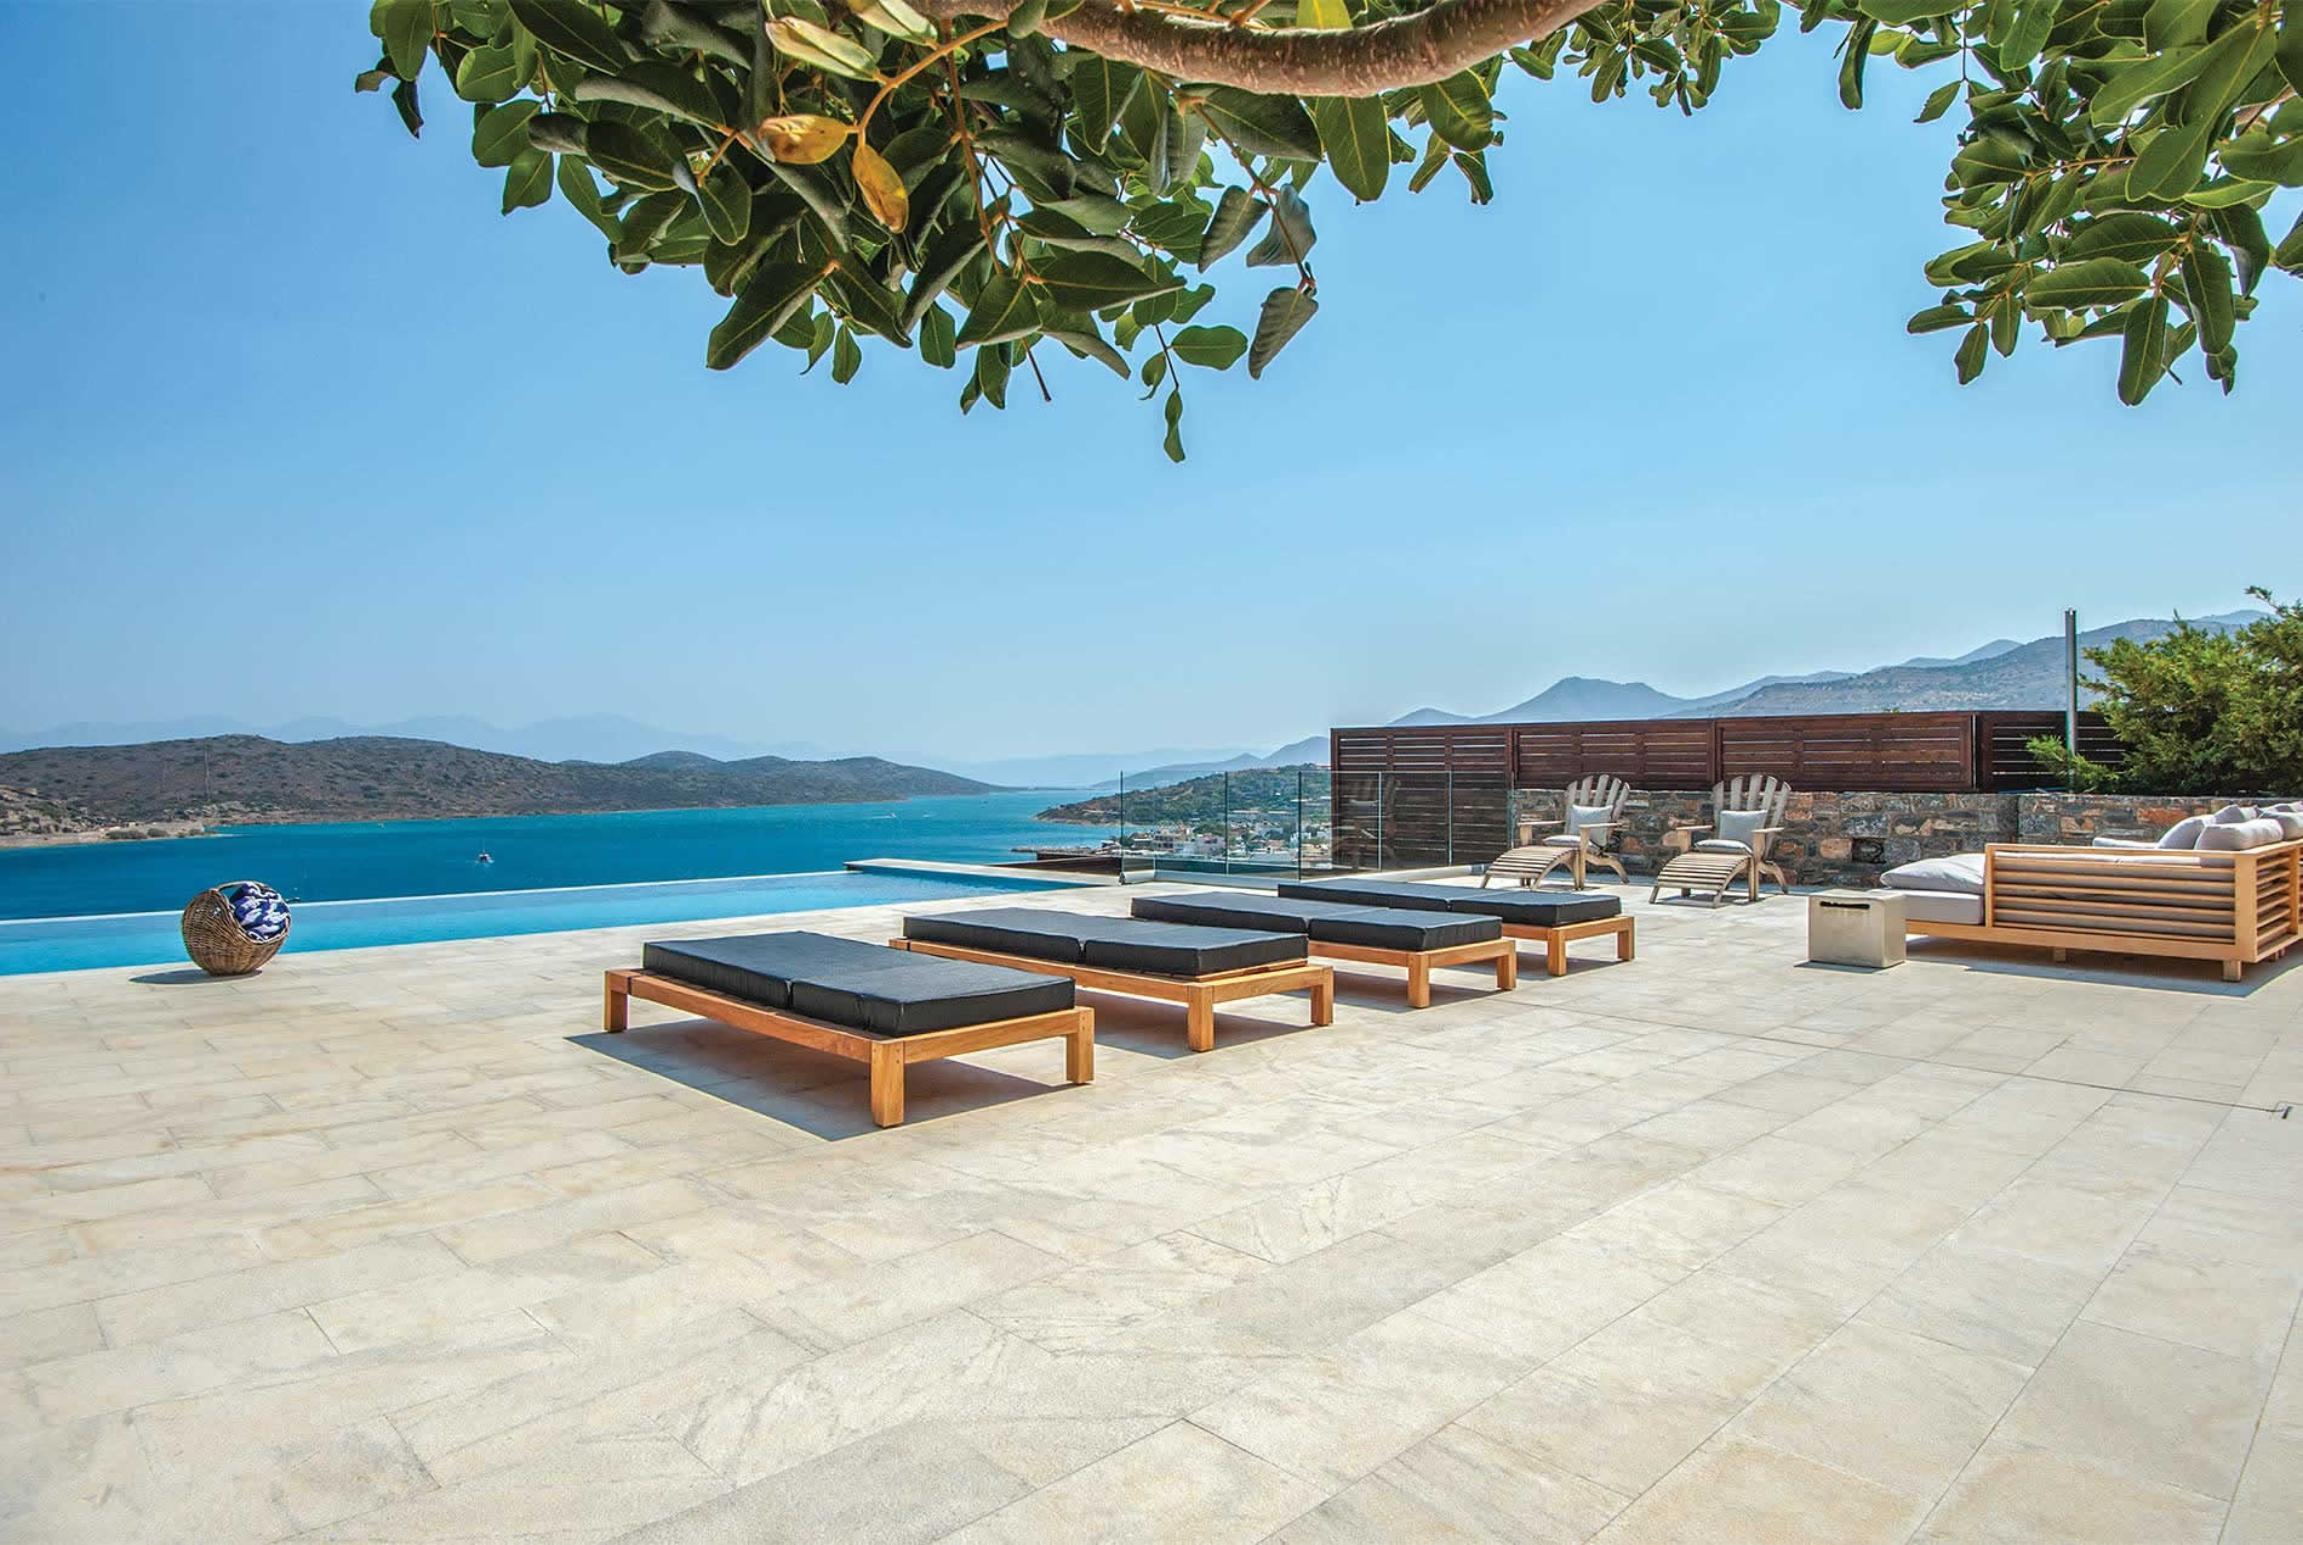 Ferienhaus Dimitra (2654194), Plaka, Kreta Nordküste, Kreta, Griechenland, Bild 16